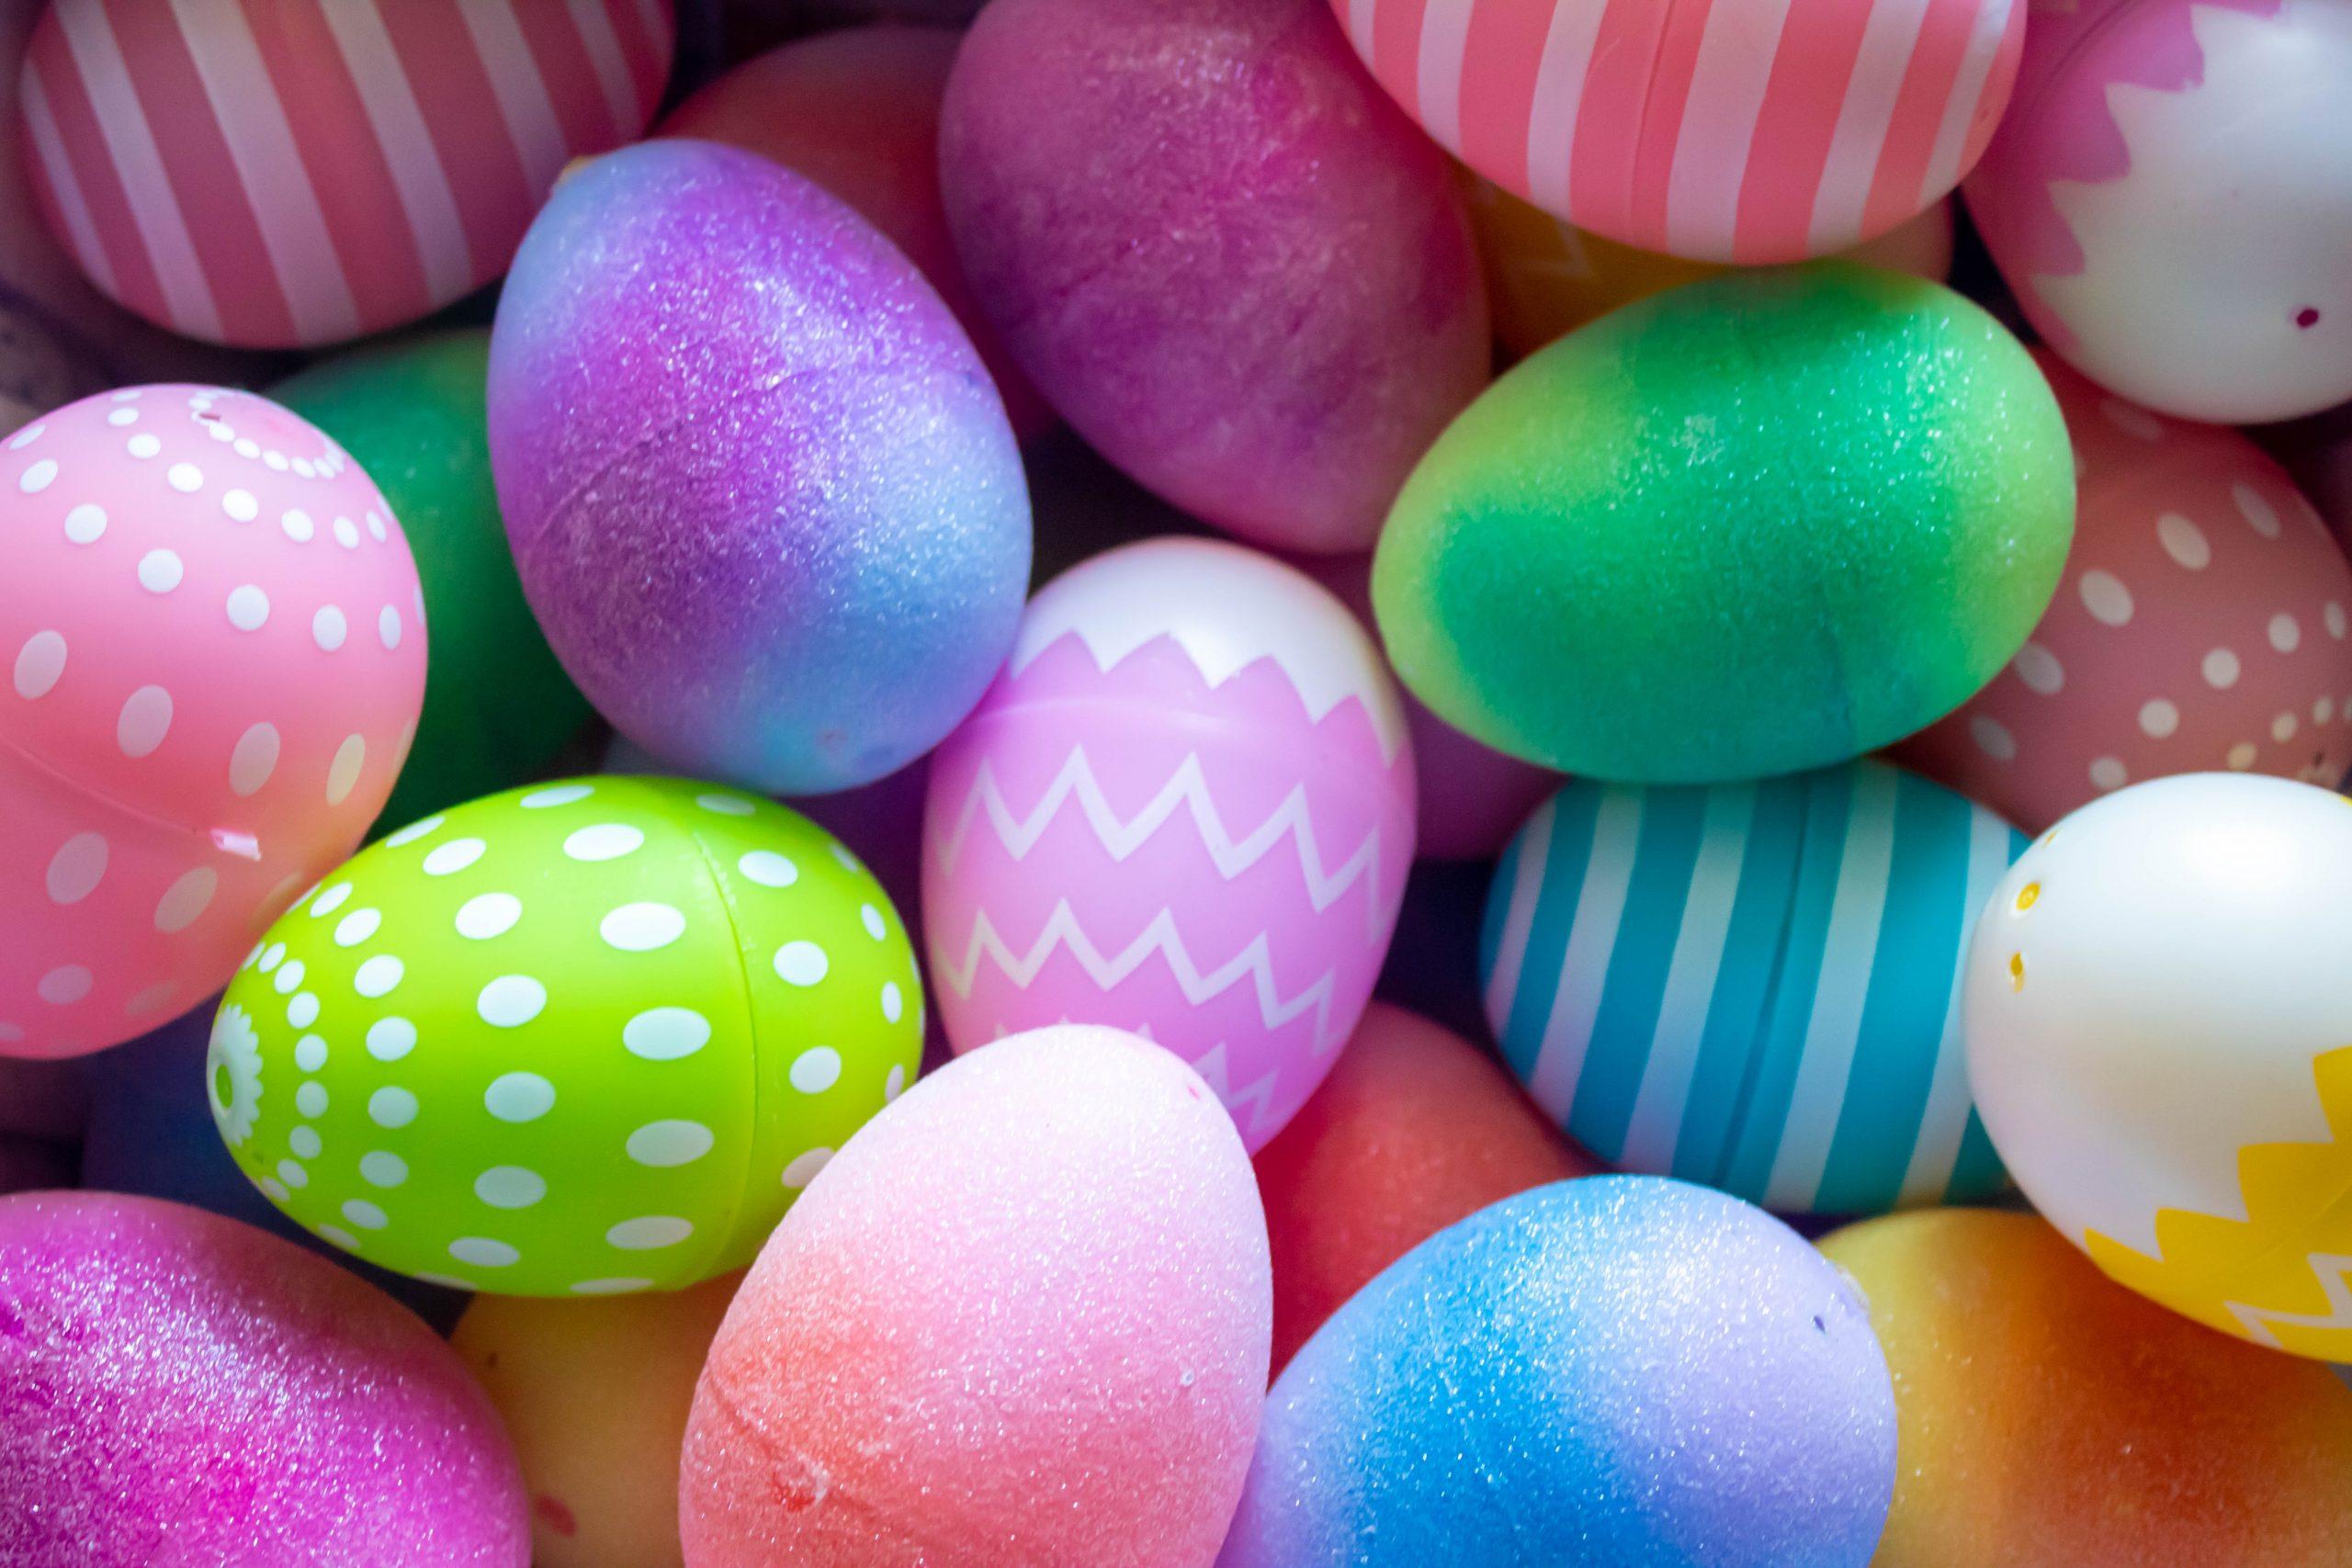 Saiba como evitar o inchaço após a Páscoa